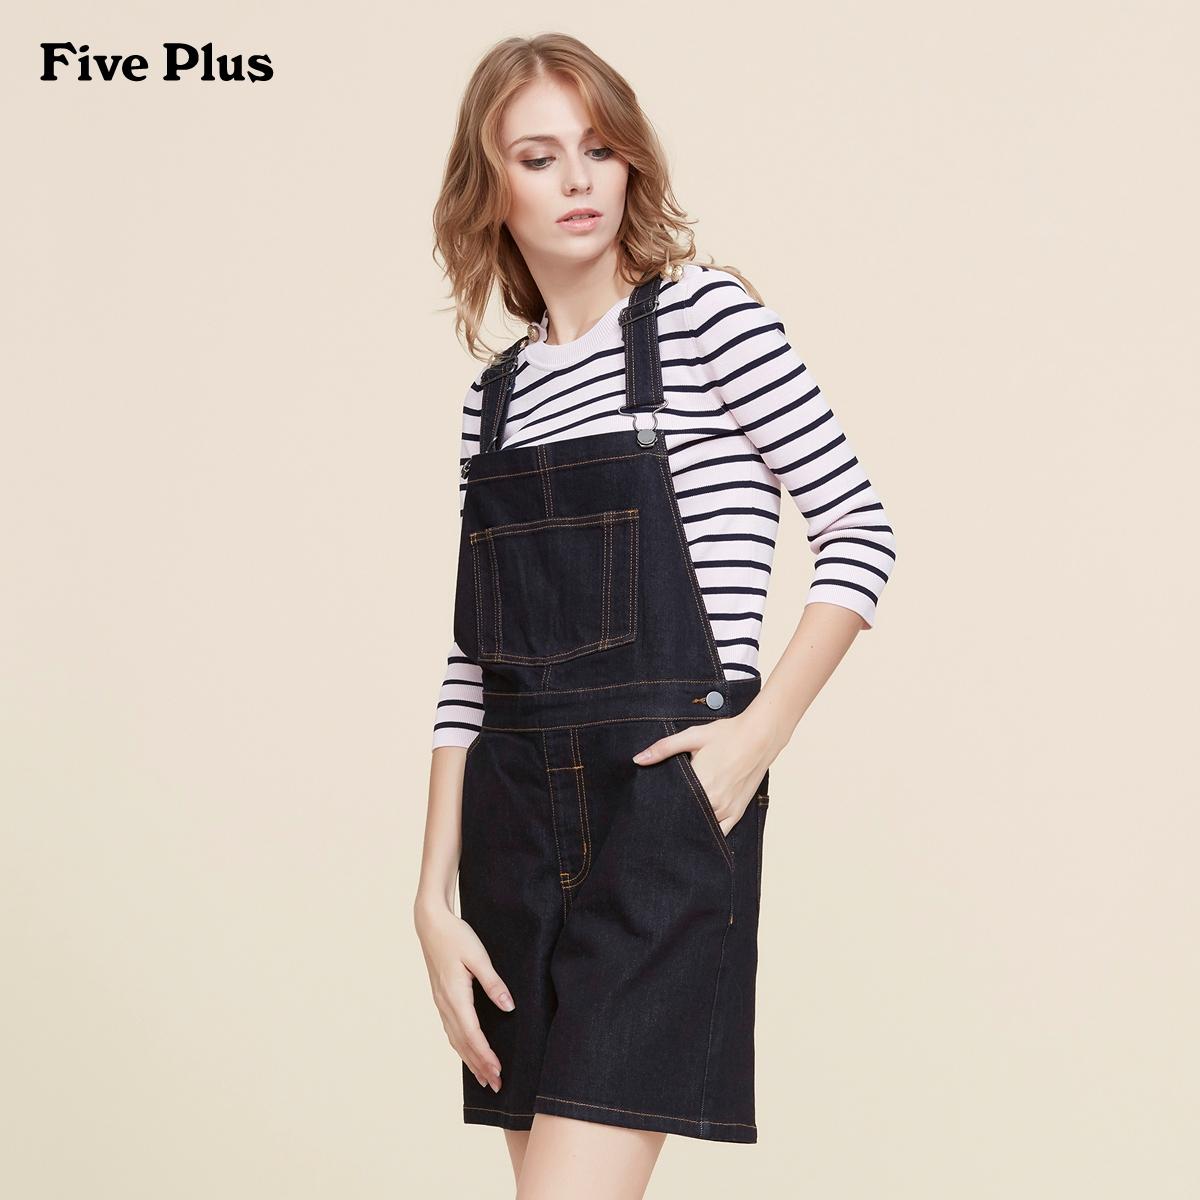 Five Plus新女夏装BF棉质宽松阔腿背带连体裤牛仔短裤2JM1064110